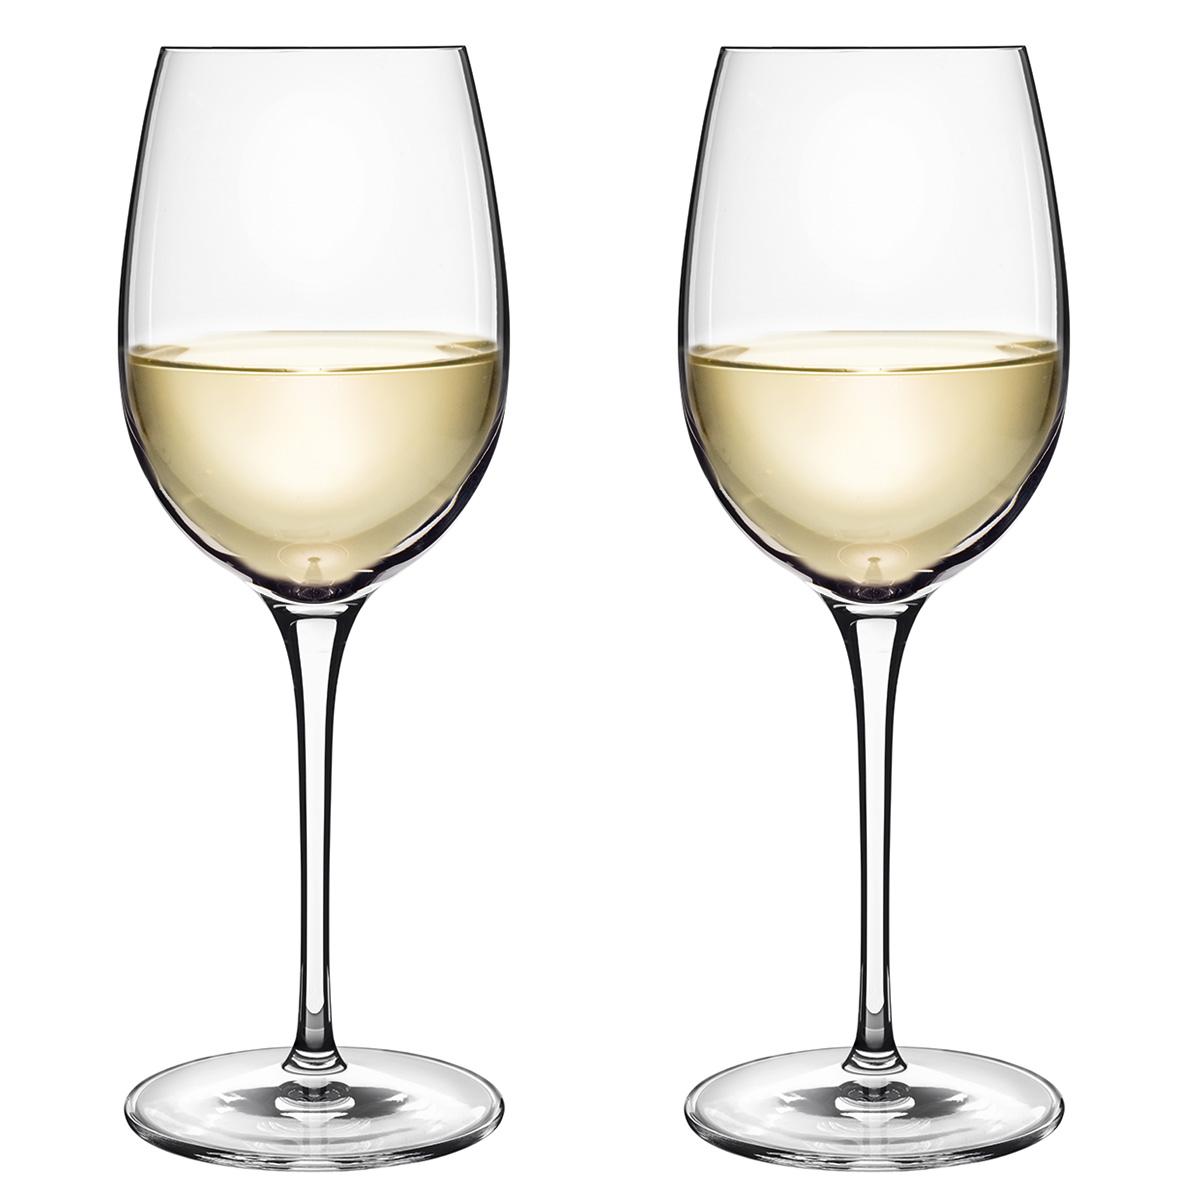 Image of   Luigi Bormioli hvidvinsglas - Vinoteque fragrante - 2 stk.